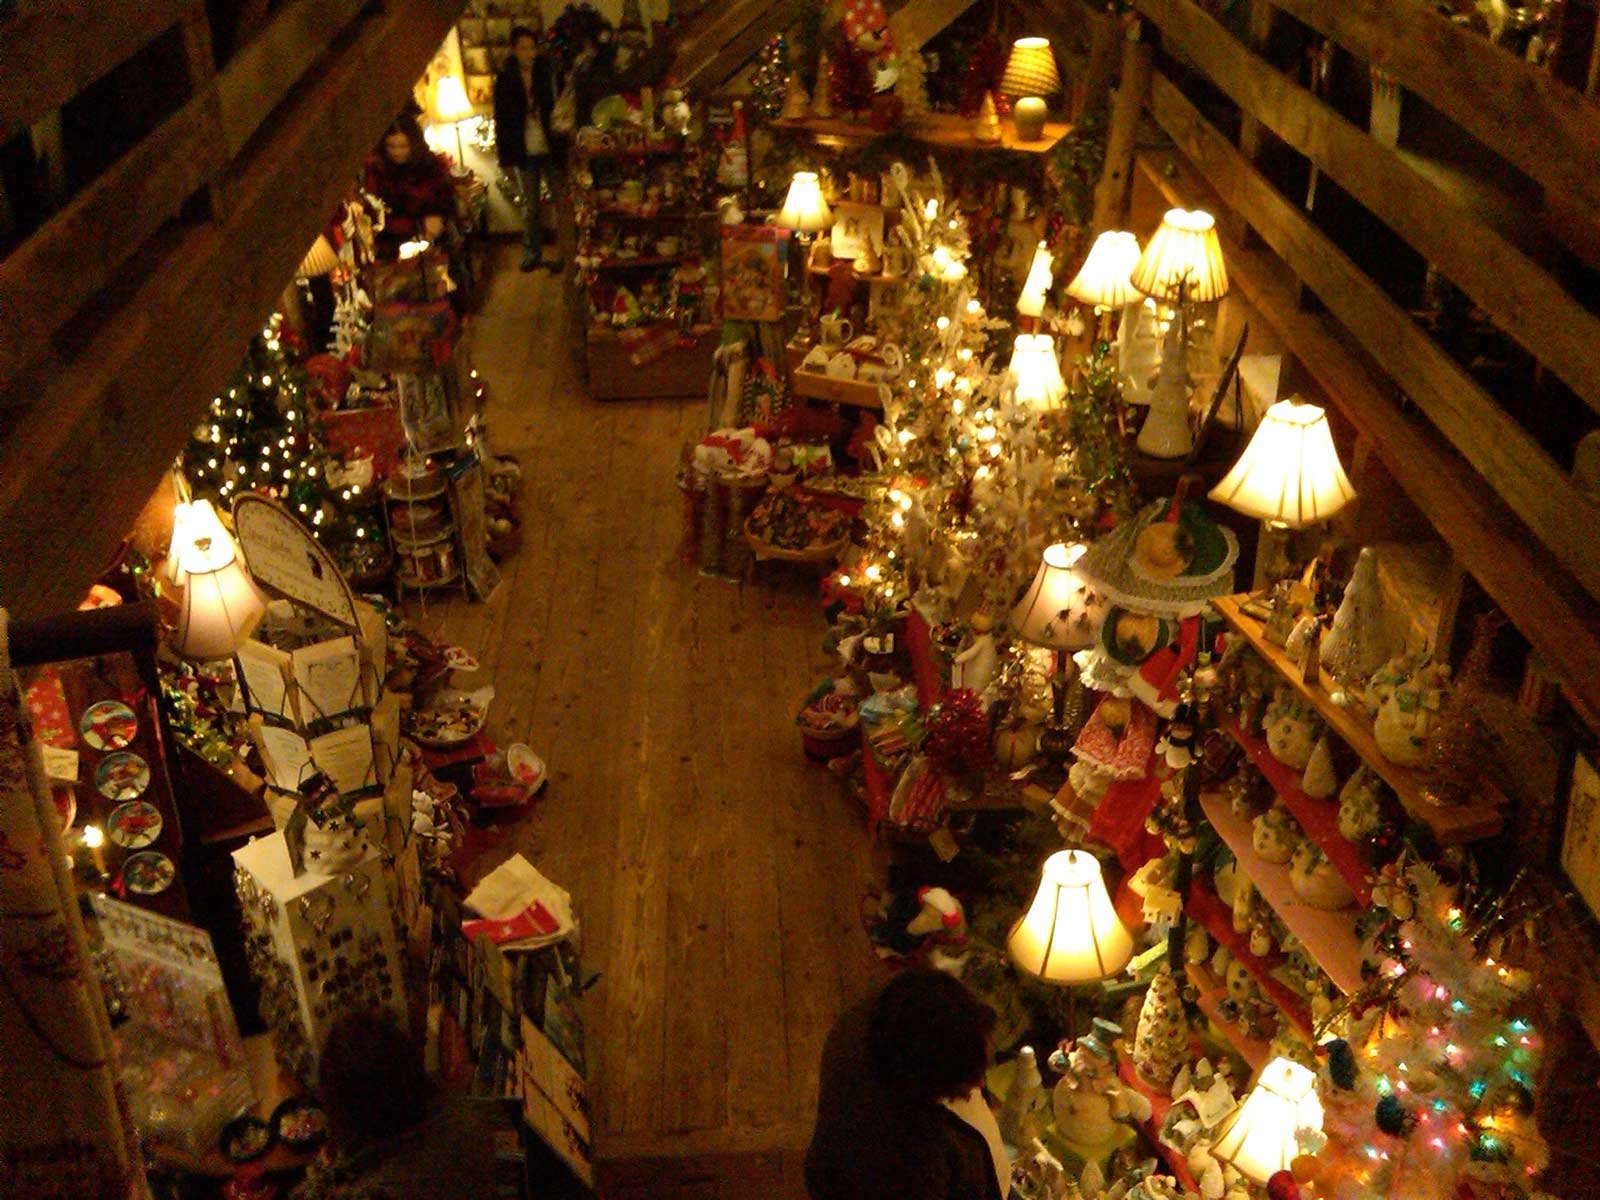 Morgan House in Dublin Ohio at Christmas